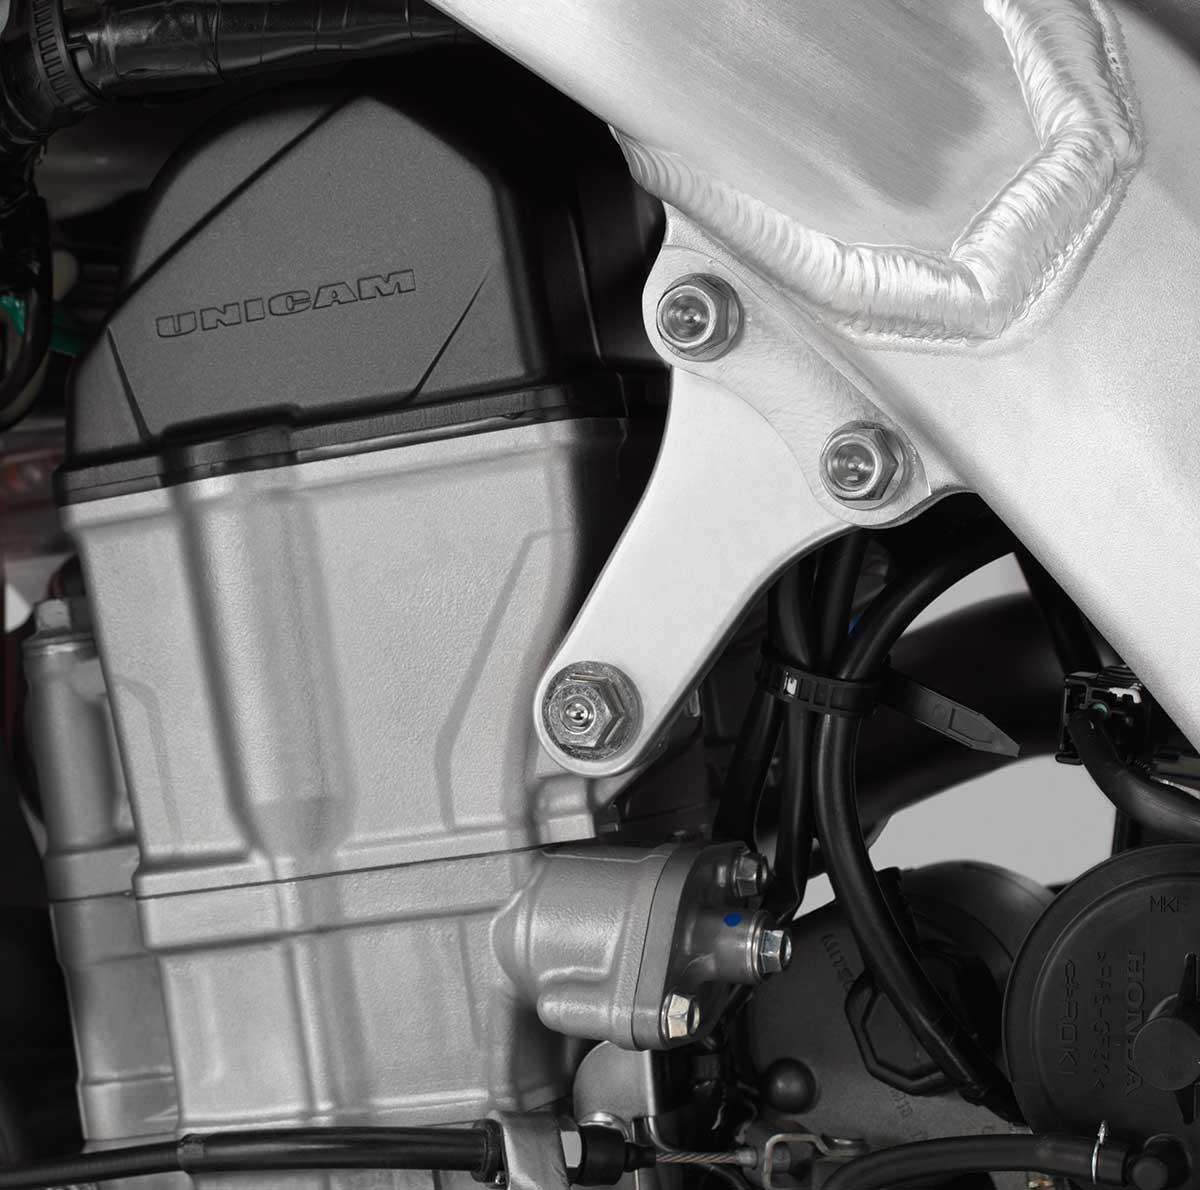 19-Honda-CRF450X_engine-hanger.jpg